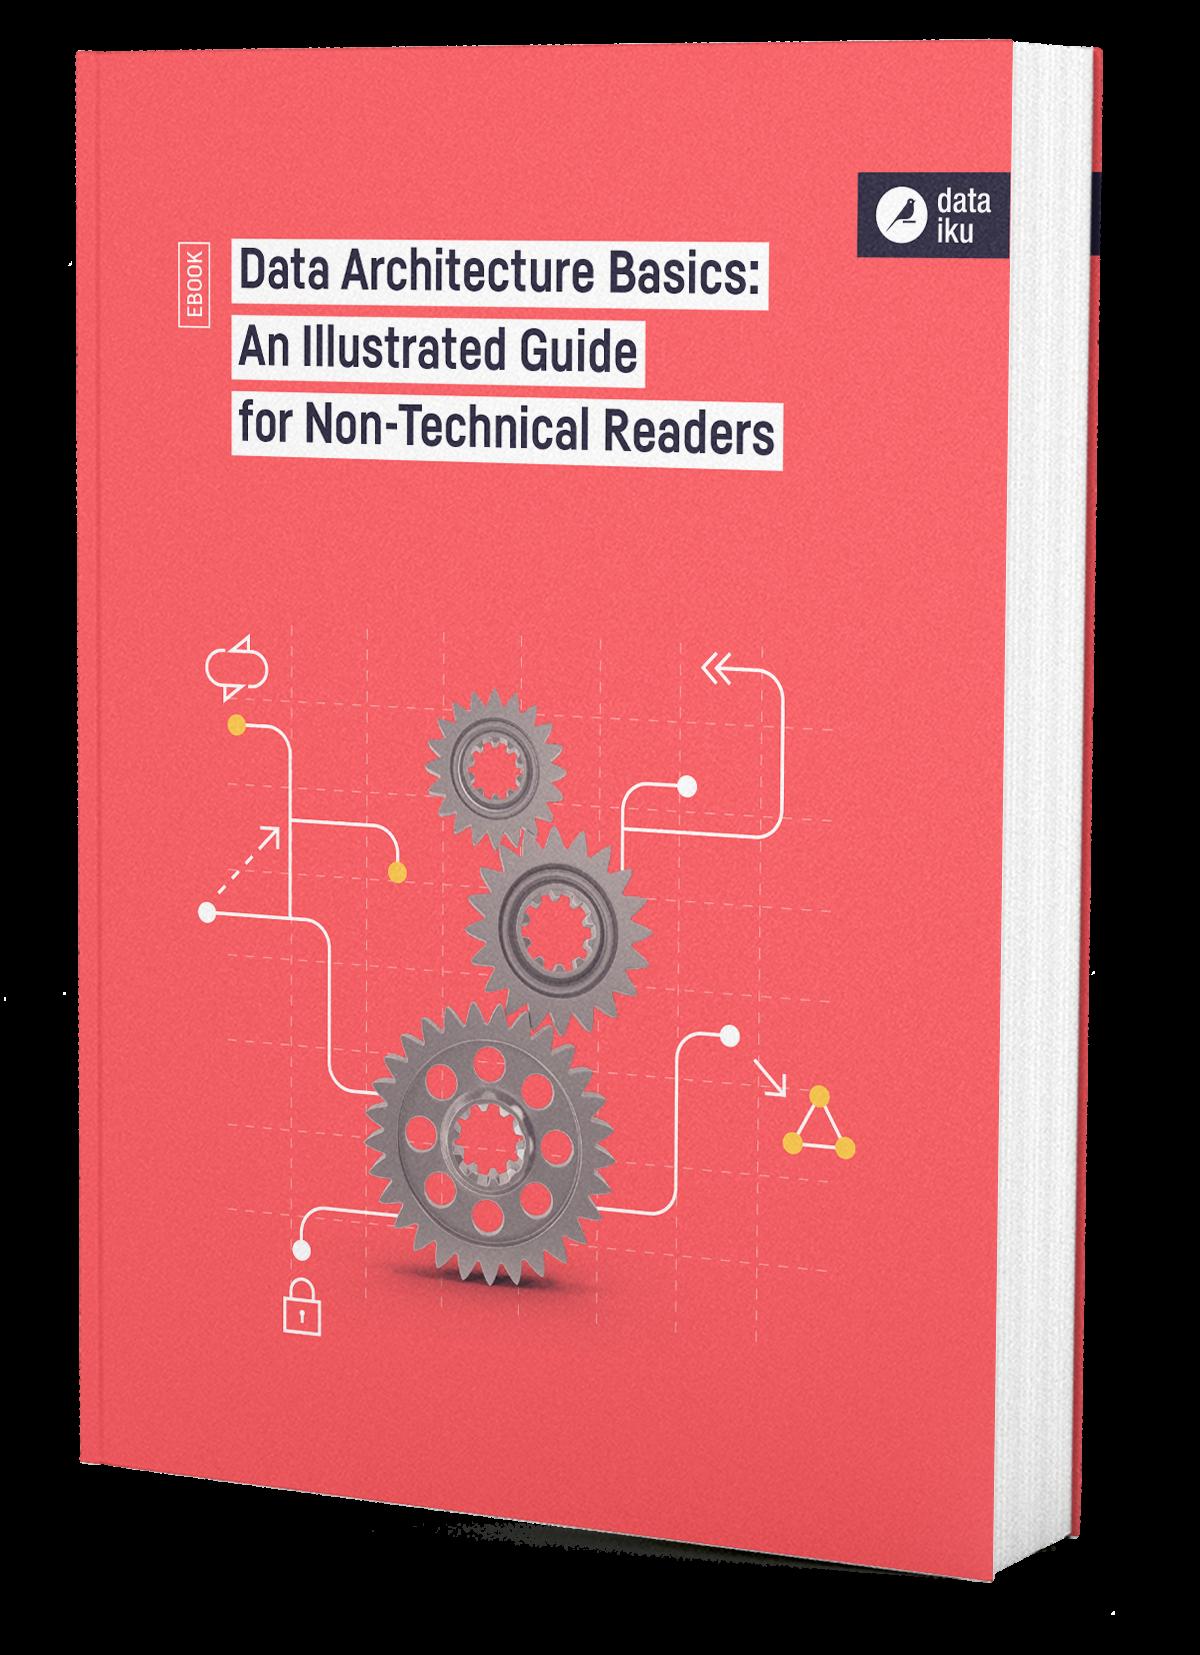 DKU-DATAIKU-EBOOK_COVER-WEB-DATA_ARCHITECTURE_BASICS-BAT_210517